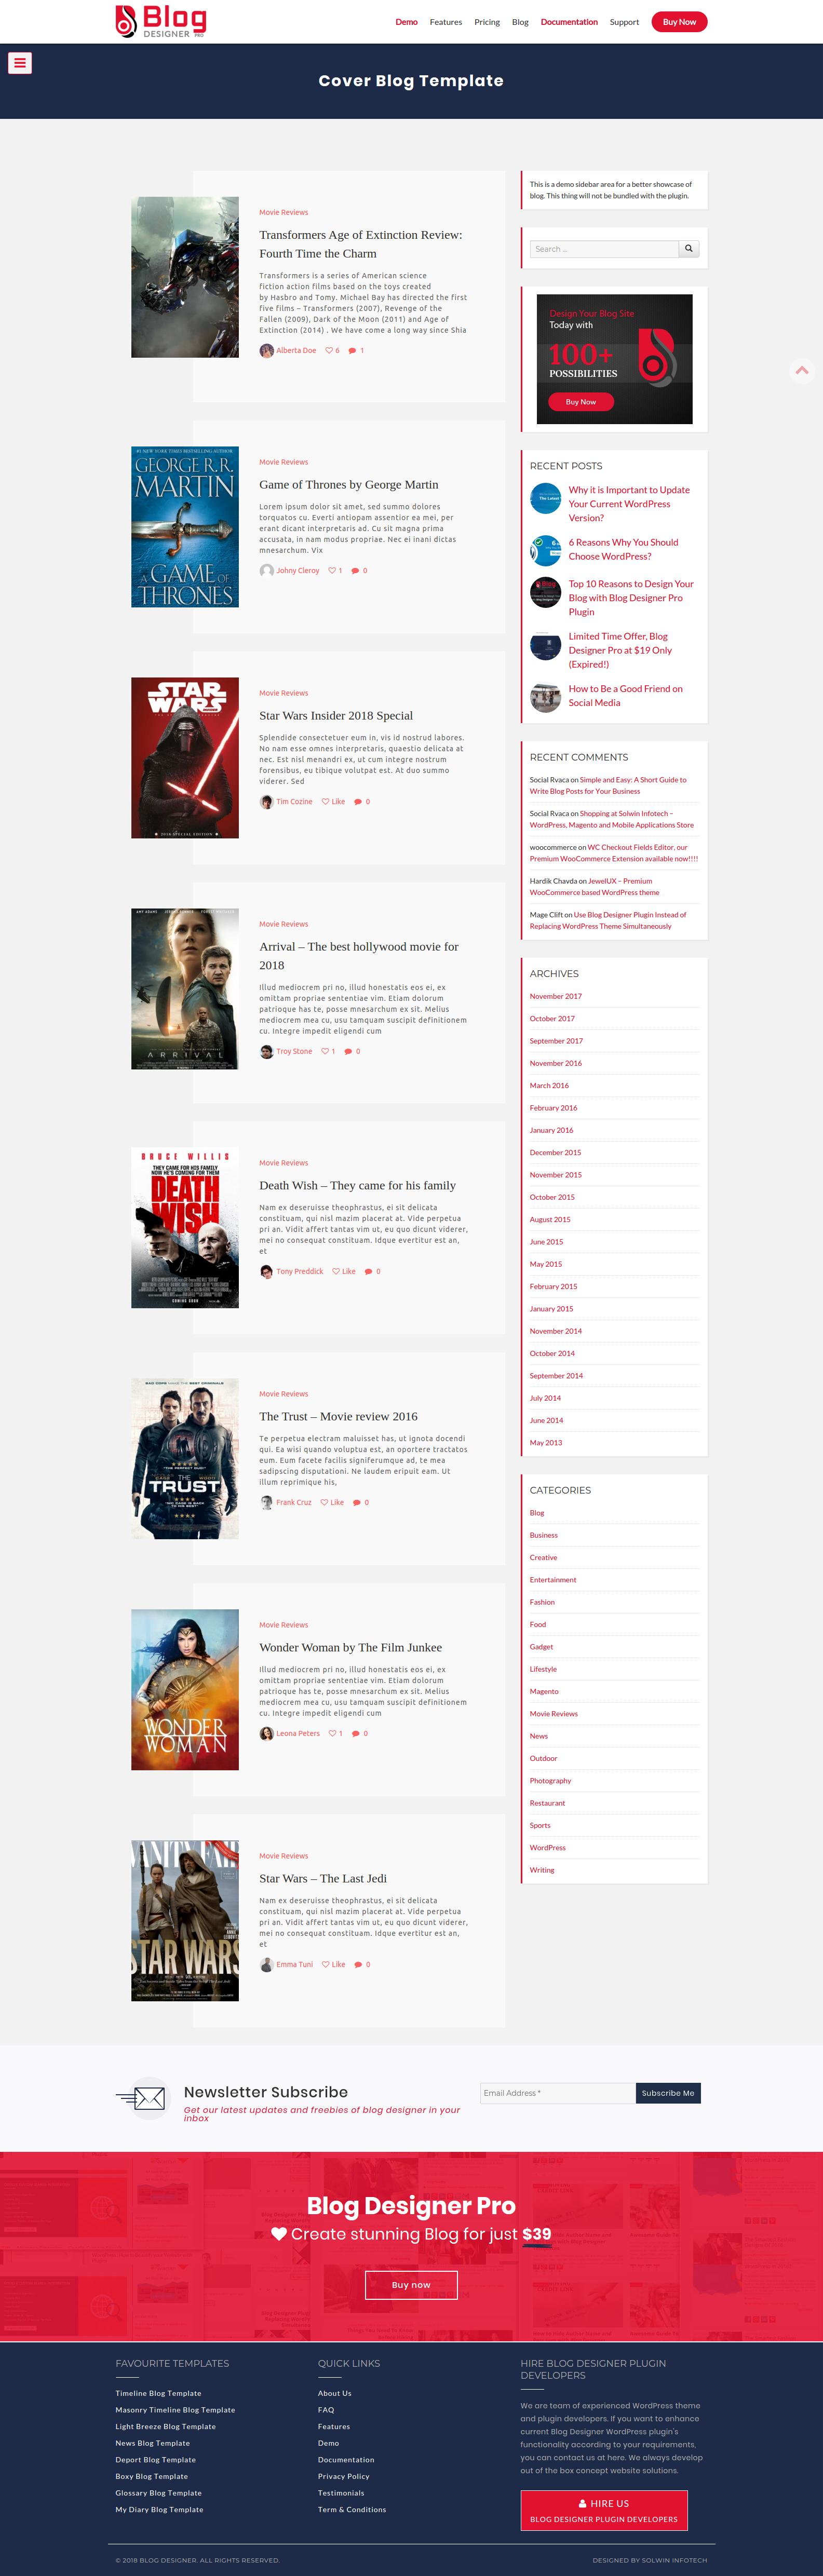 Cover Blog Template Wordpress Plugins Pinterest